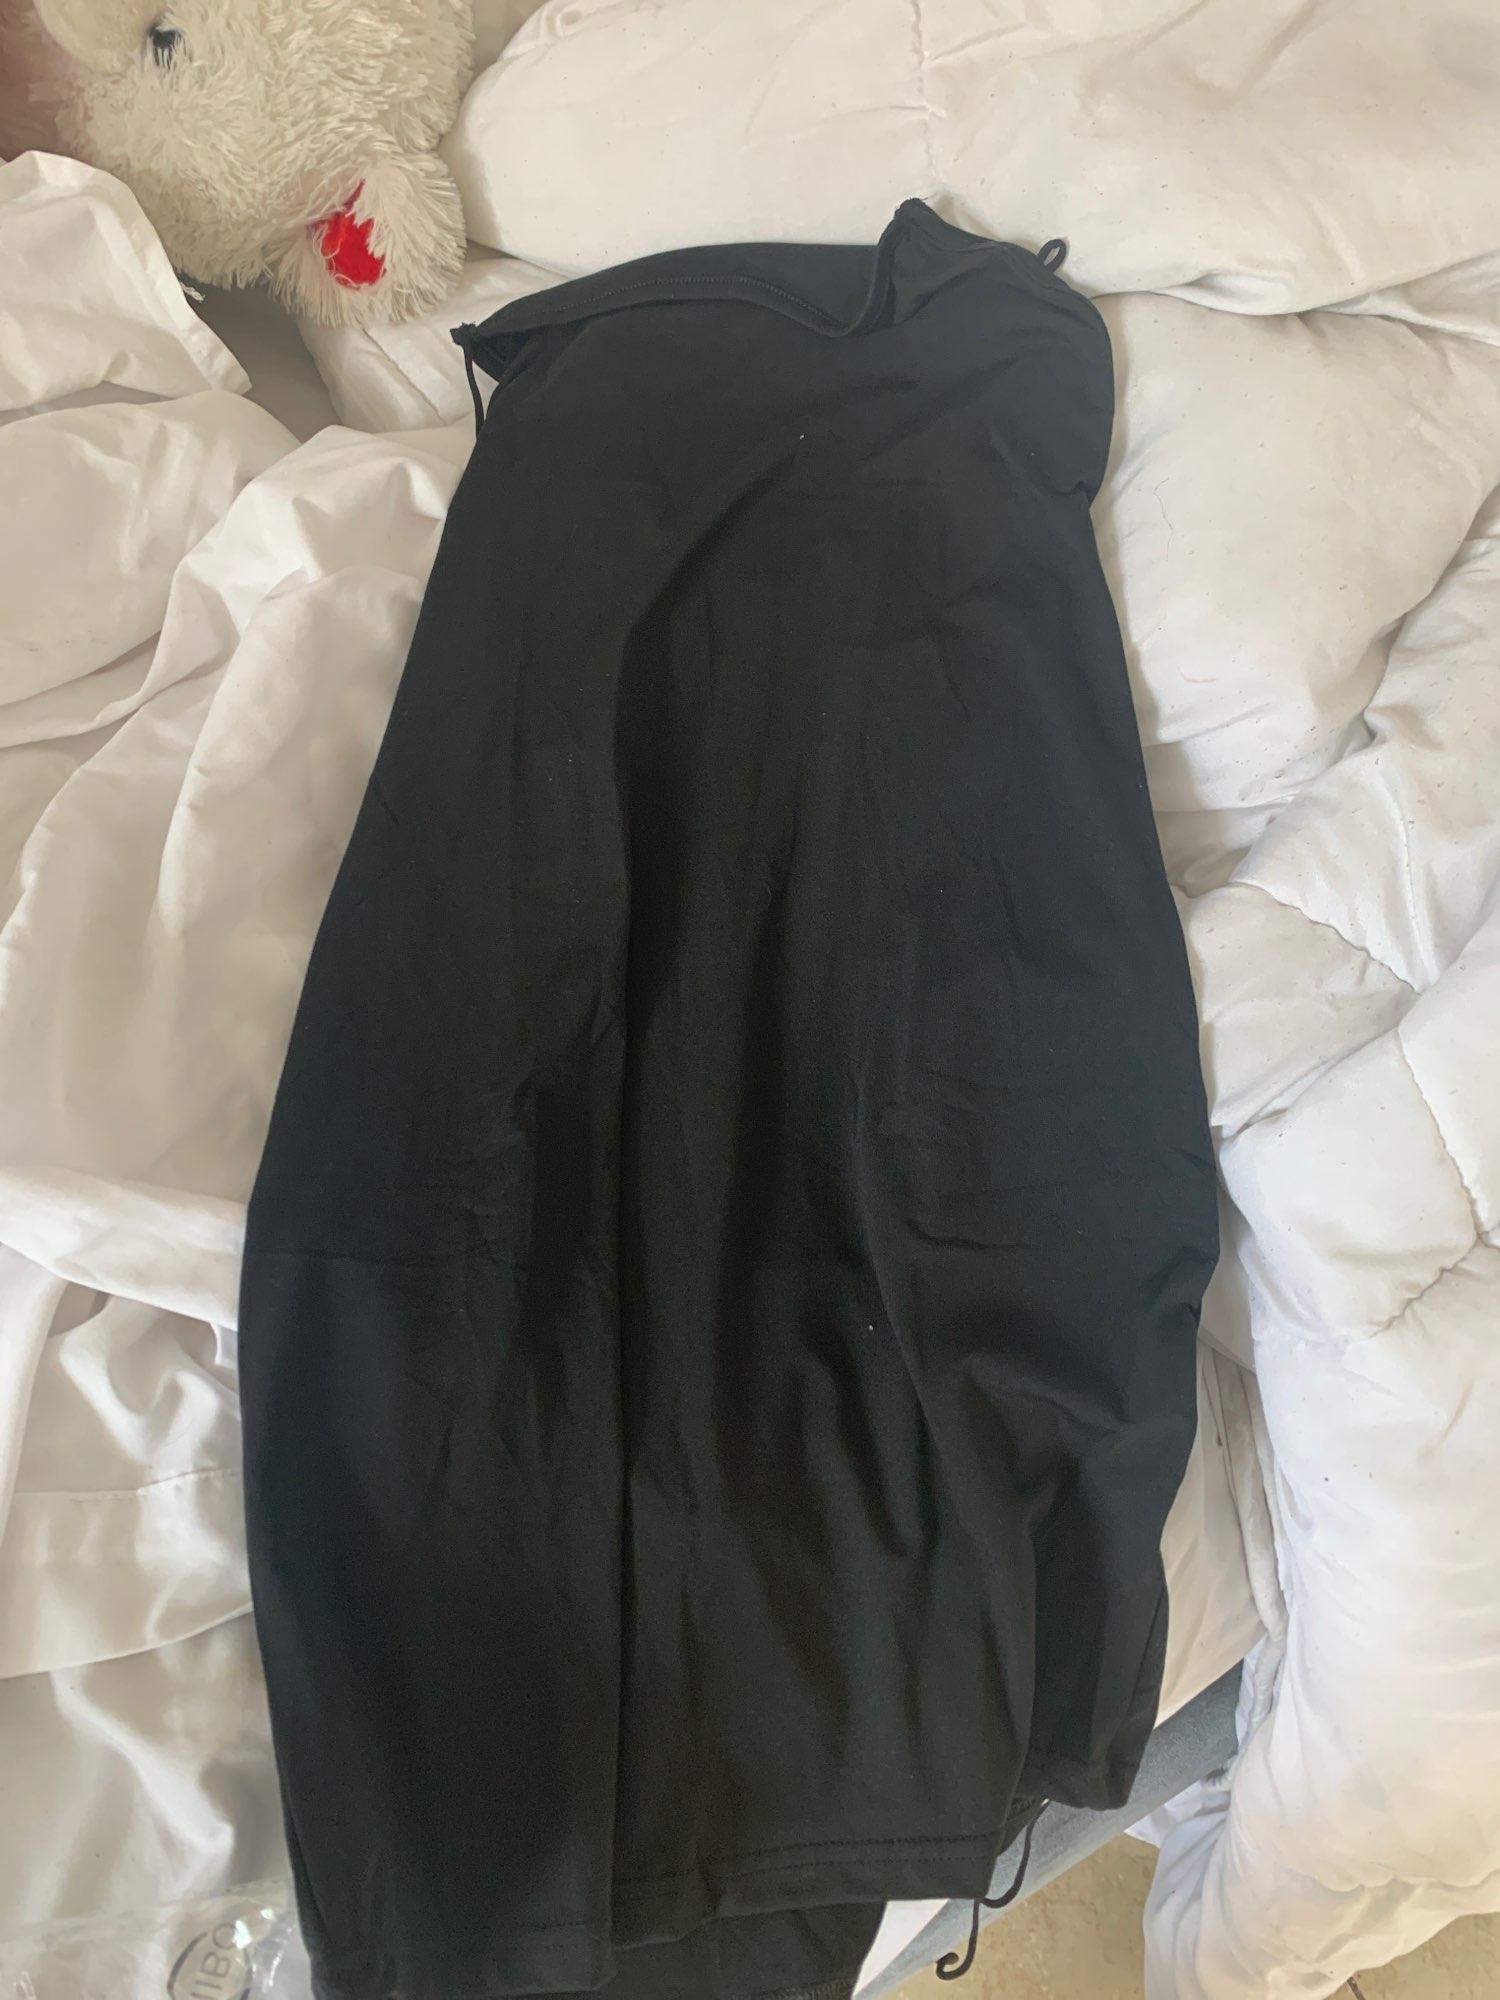 Women Sexy Bodycon Party Dresses Backless Spaghetti Straps Clubwear Mini Dress low neck drop shipping|Dresses|   - AliExpress